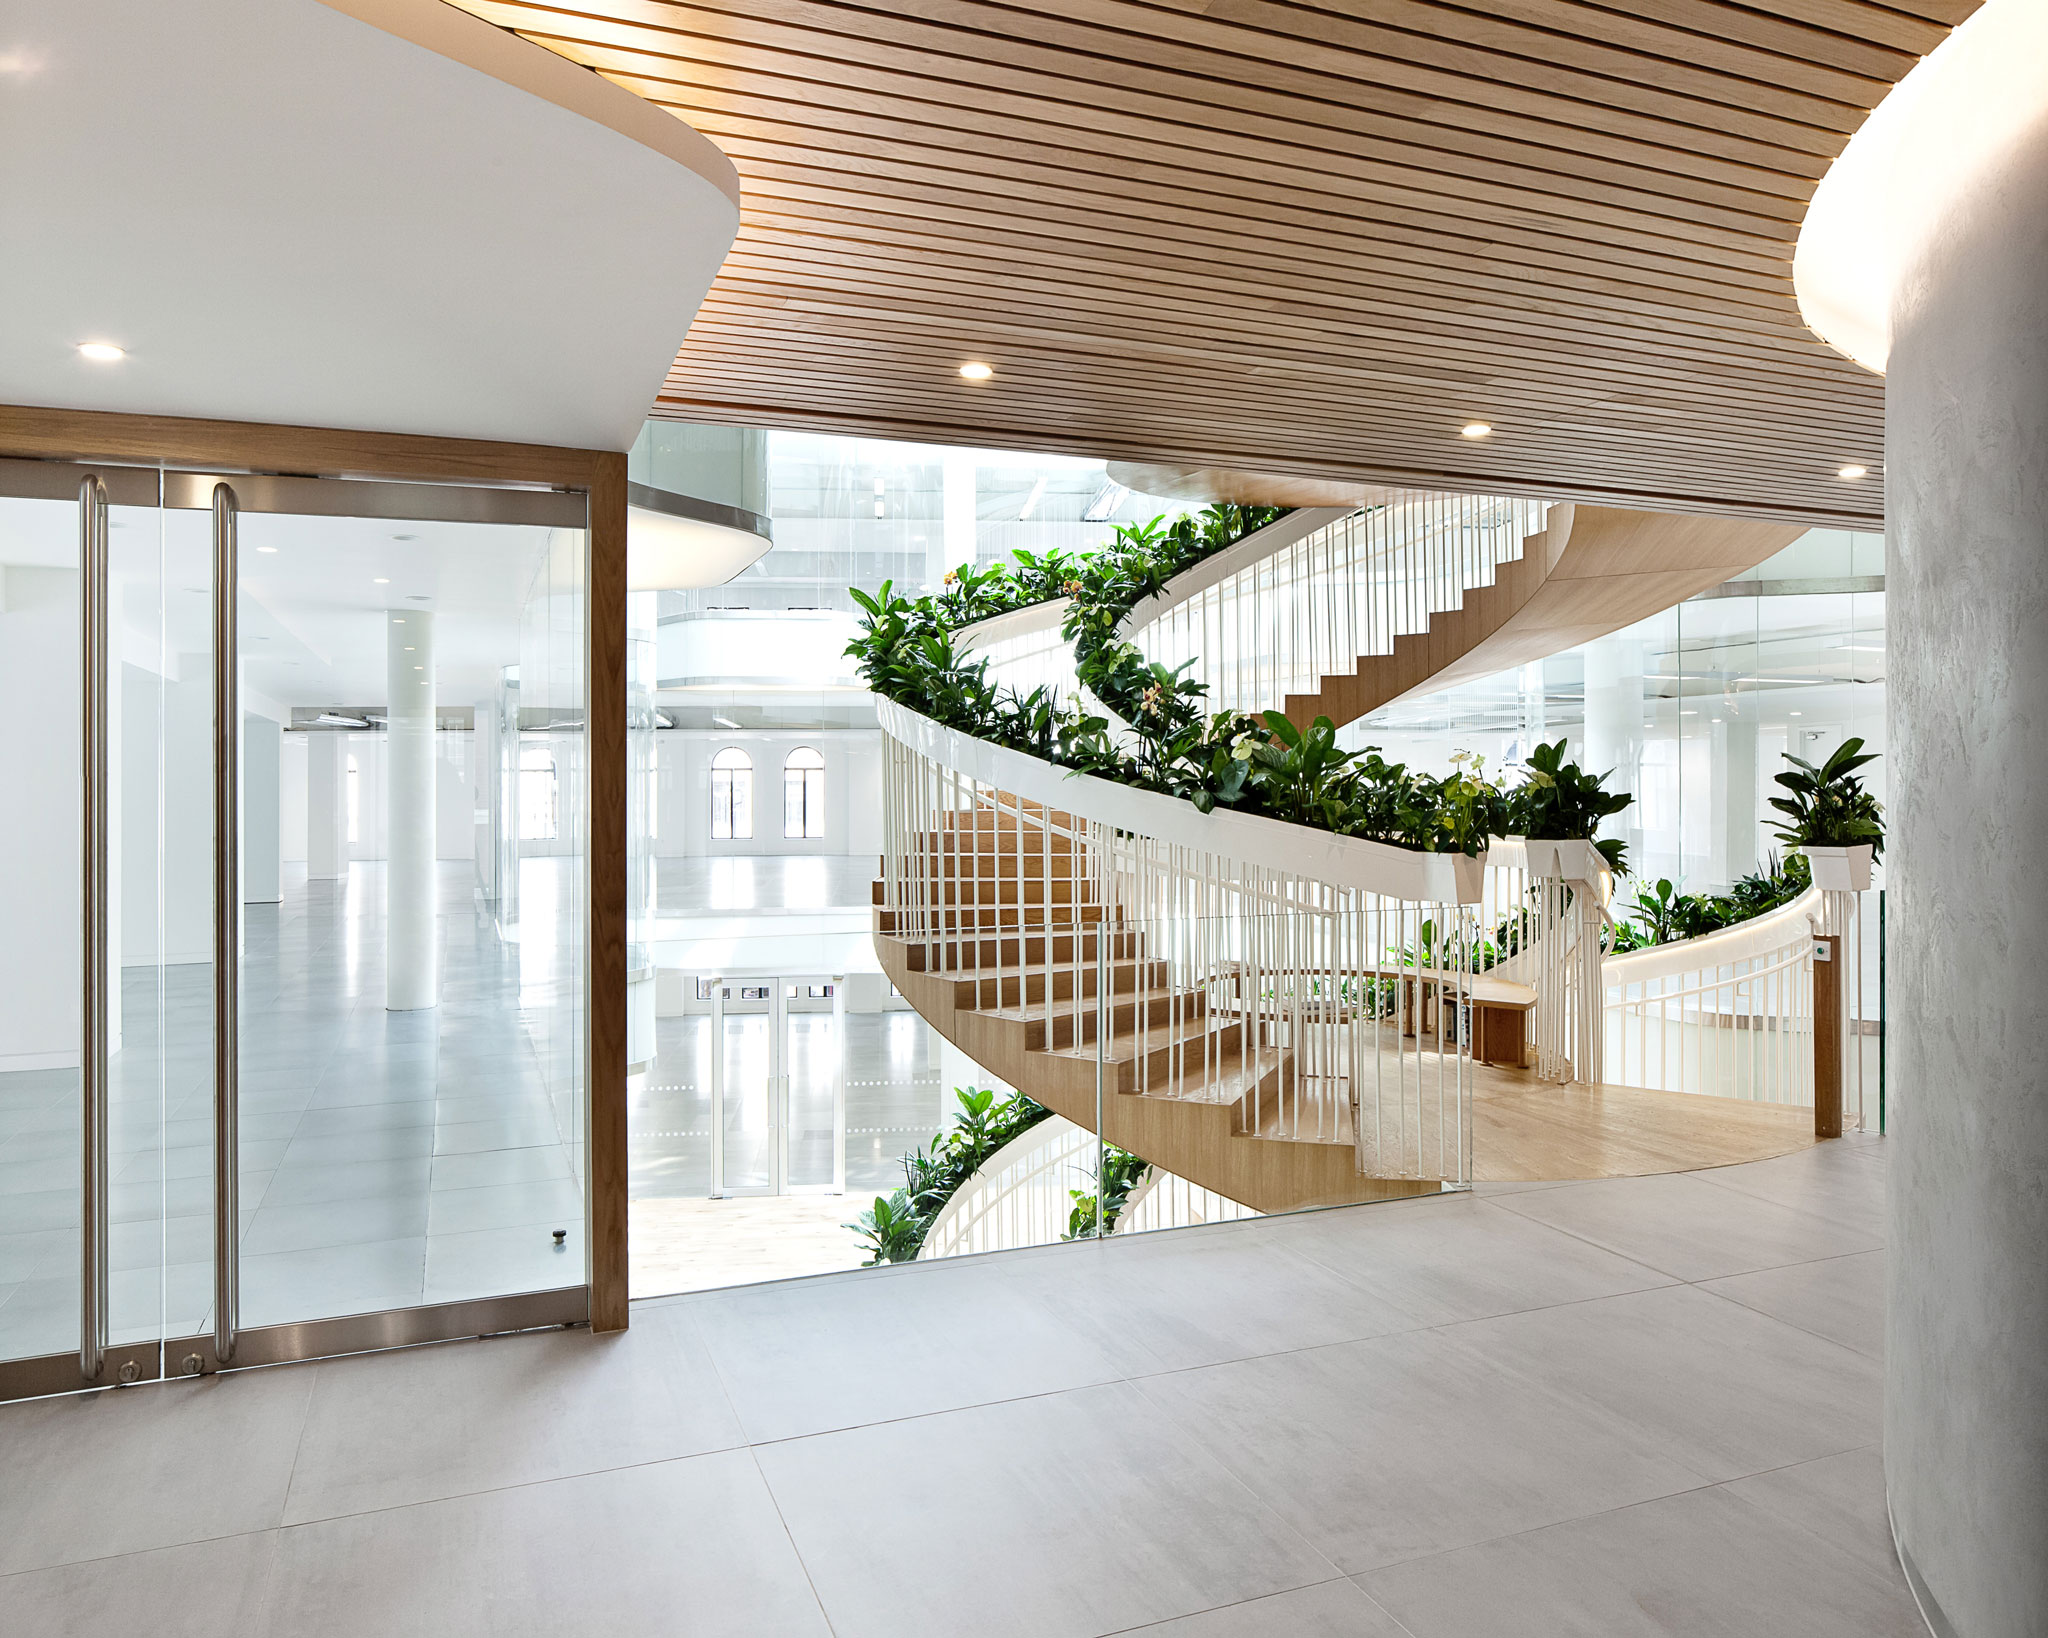 Ampersand Building interior